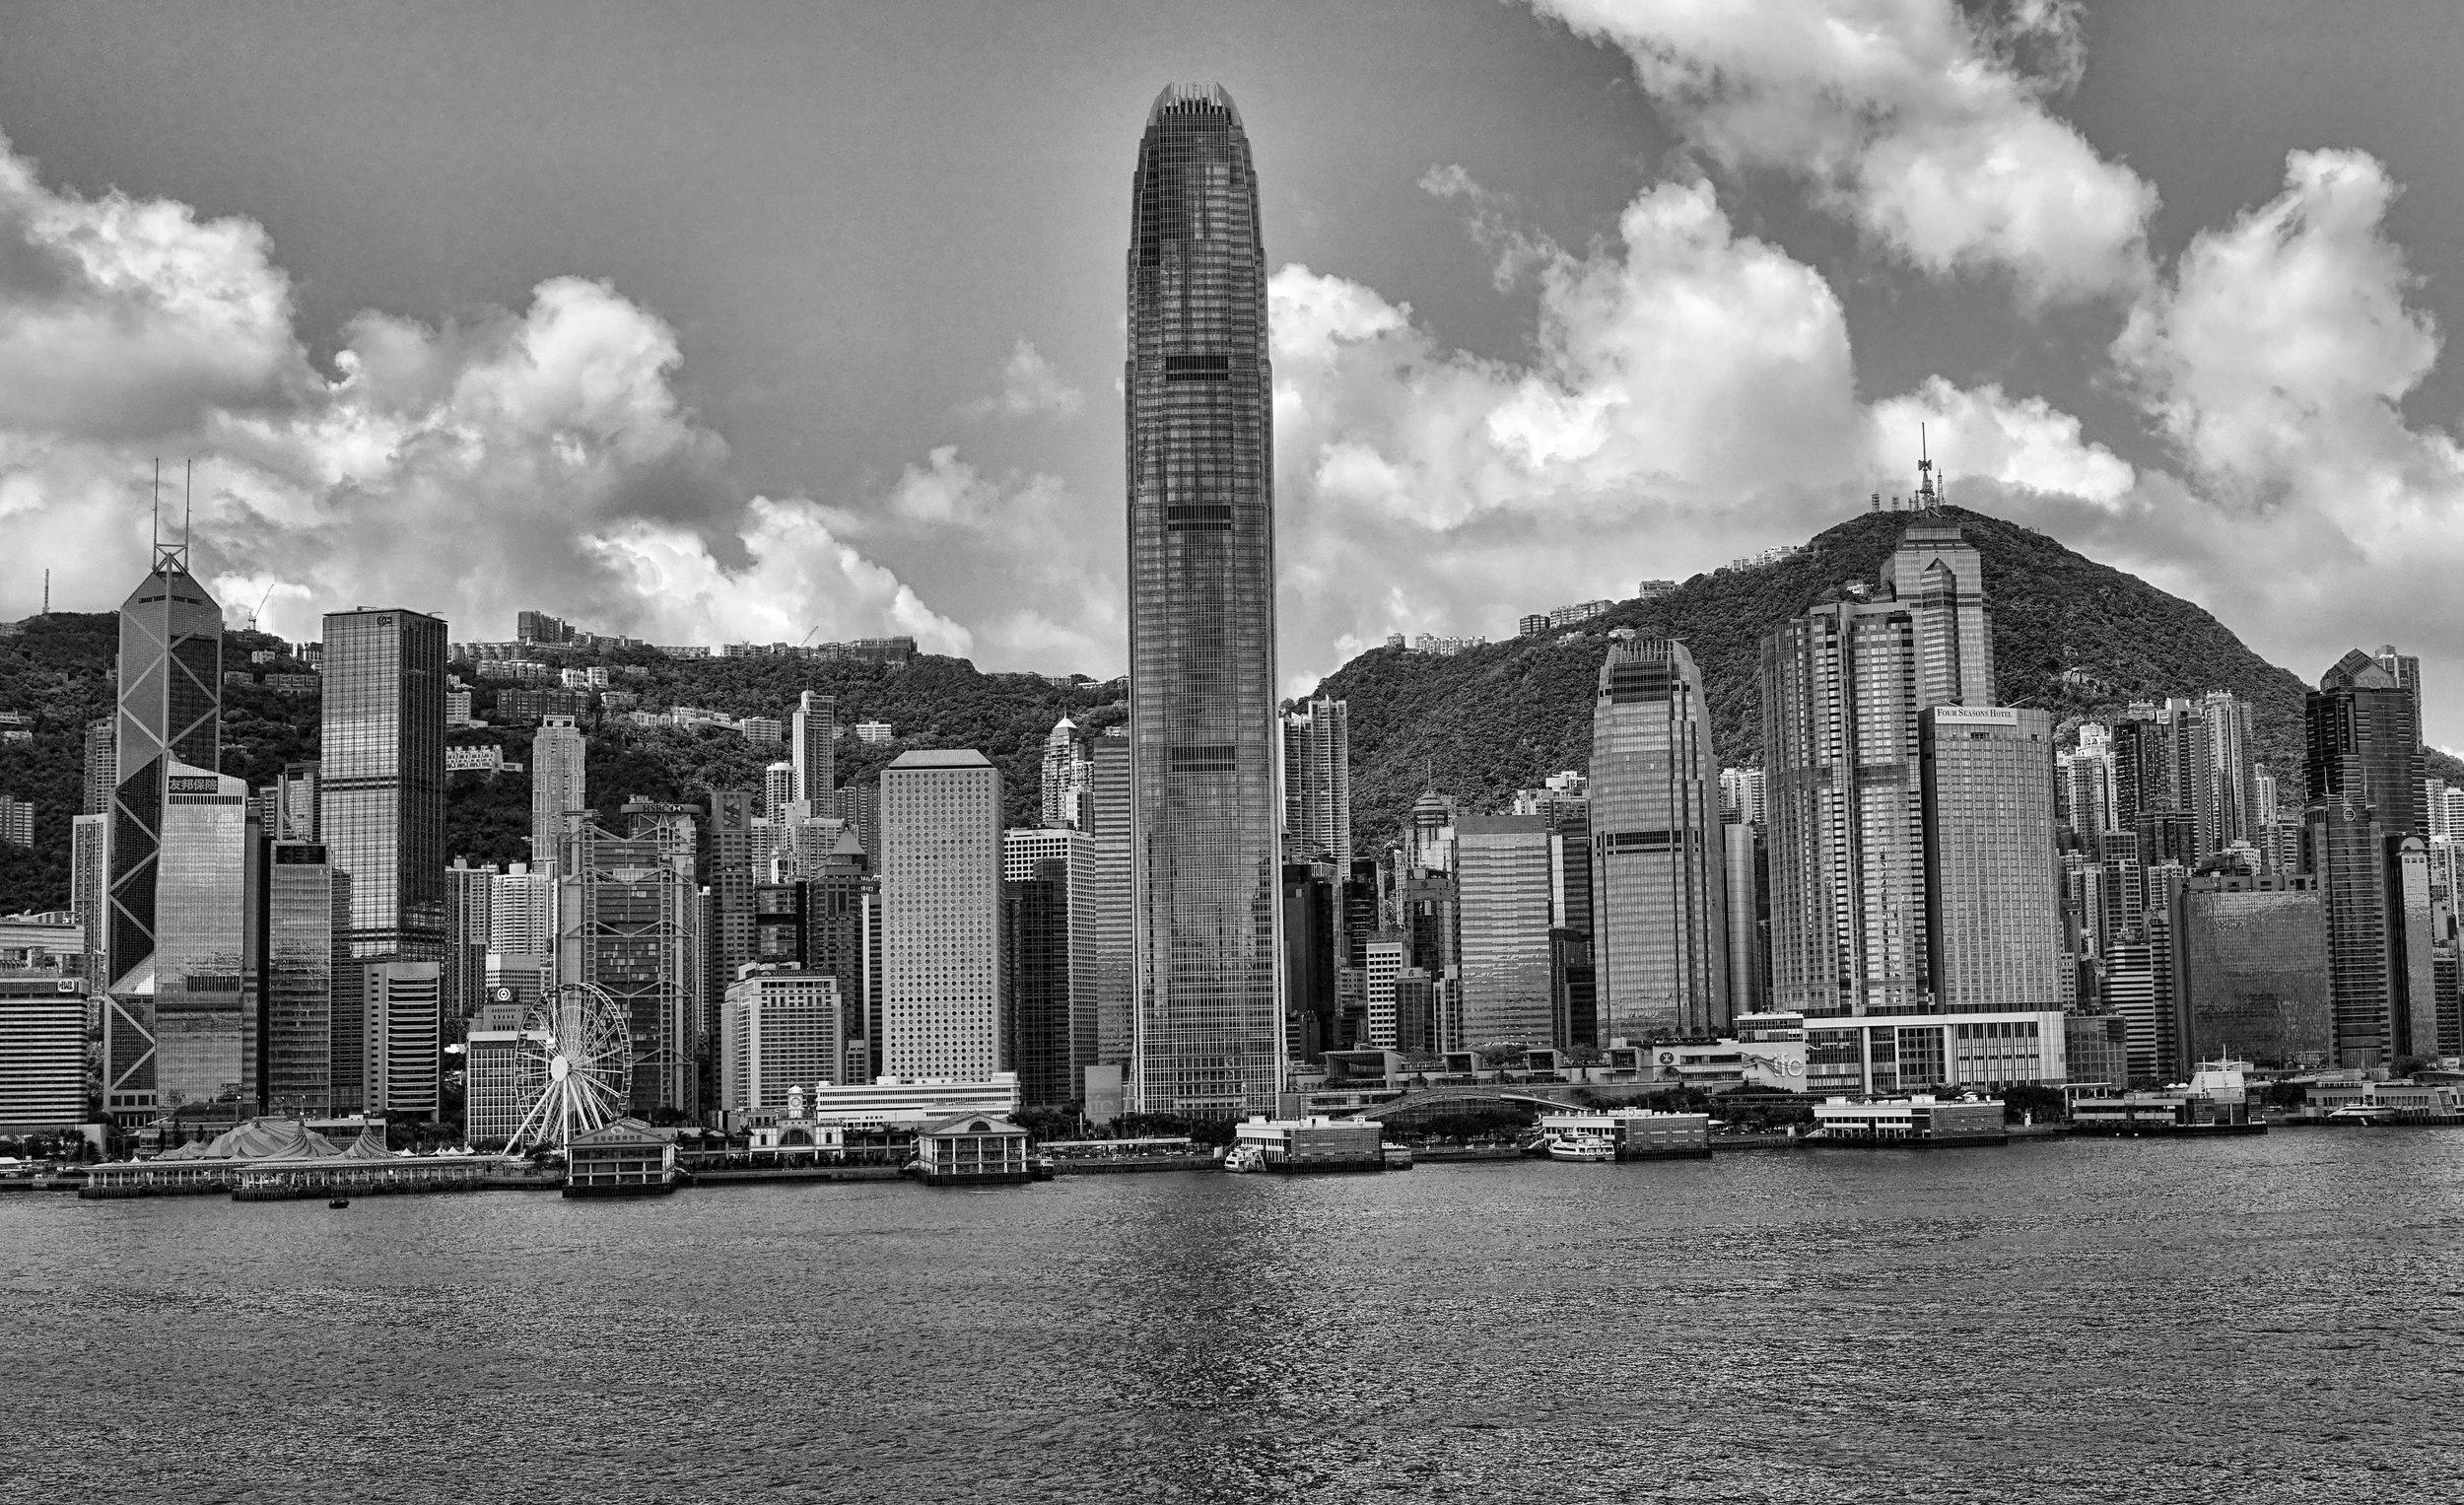 Hong Kong Island as seen from the Ocean Terminal Deck in Kowloon, Hong Kong.jpg